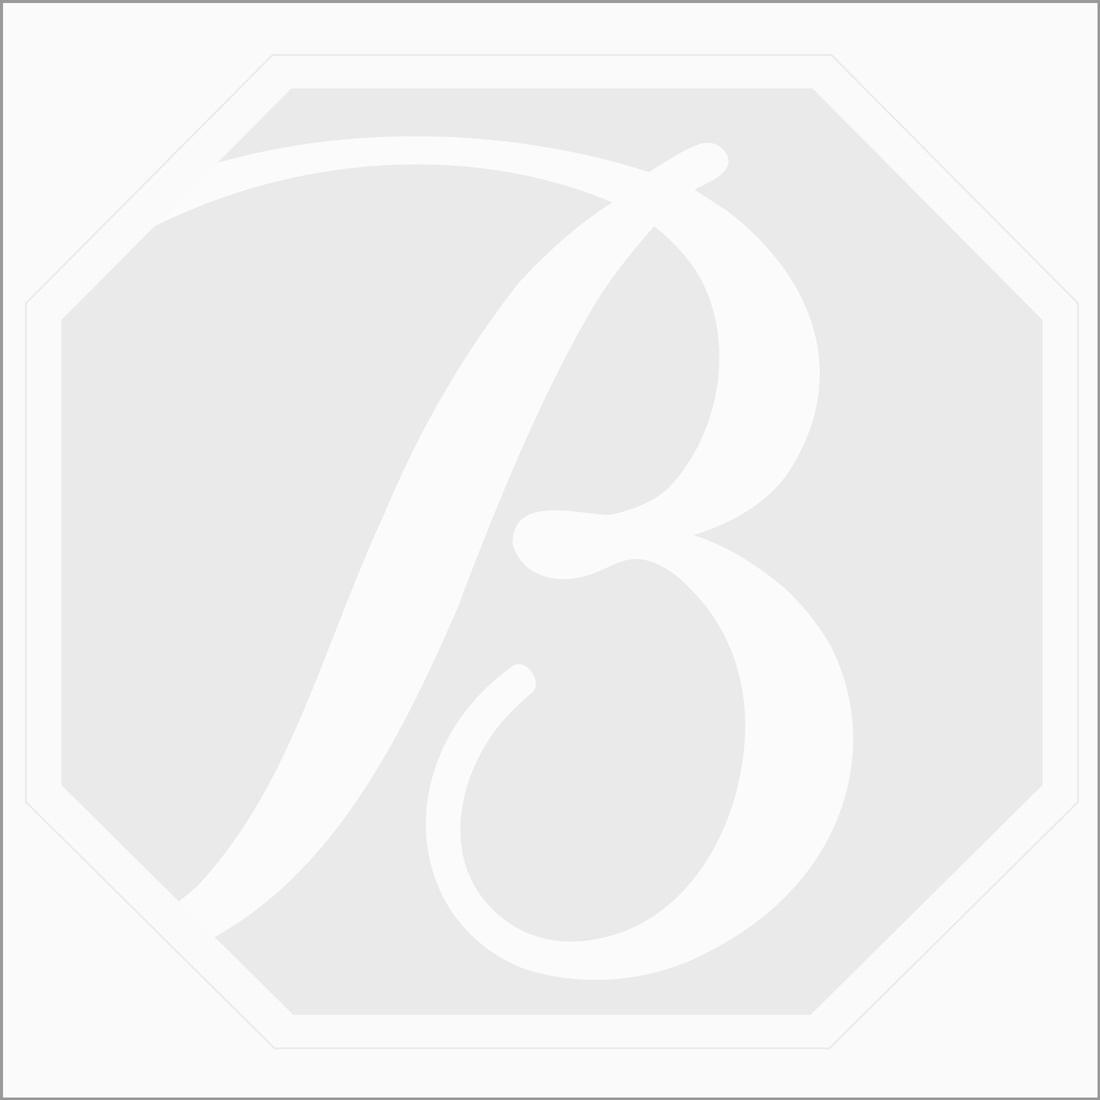 43 x 24 mm - Medium Tones Tourmaline Carving - 101.00 carats (ToCarv1001)